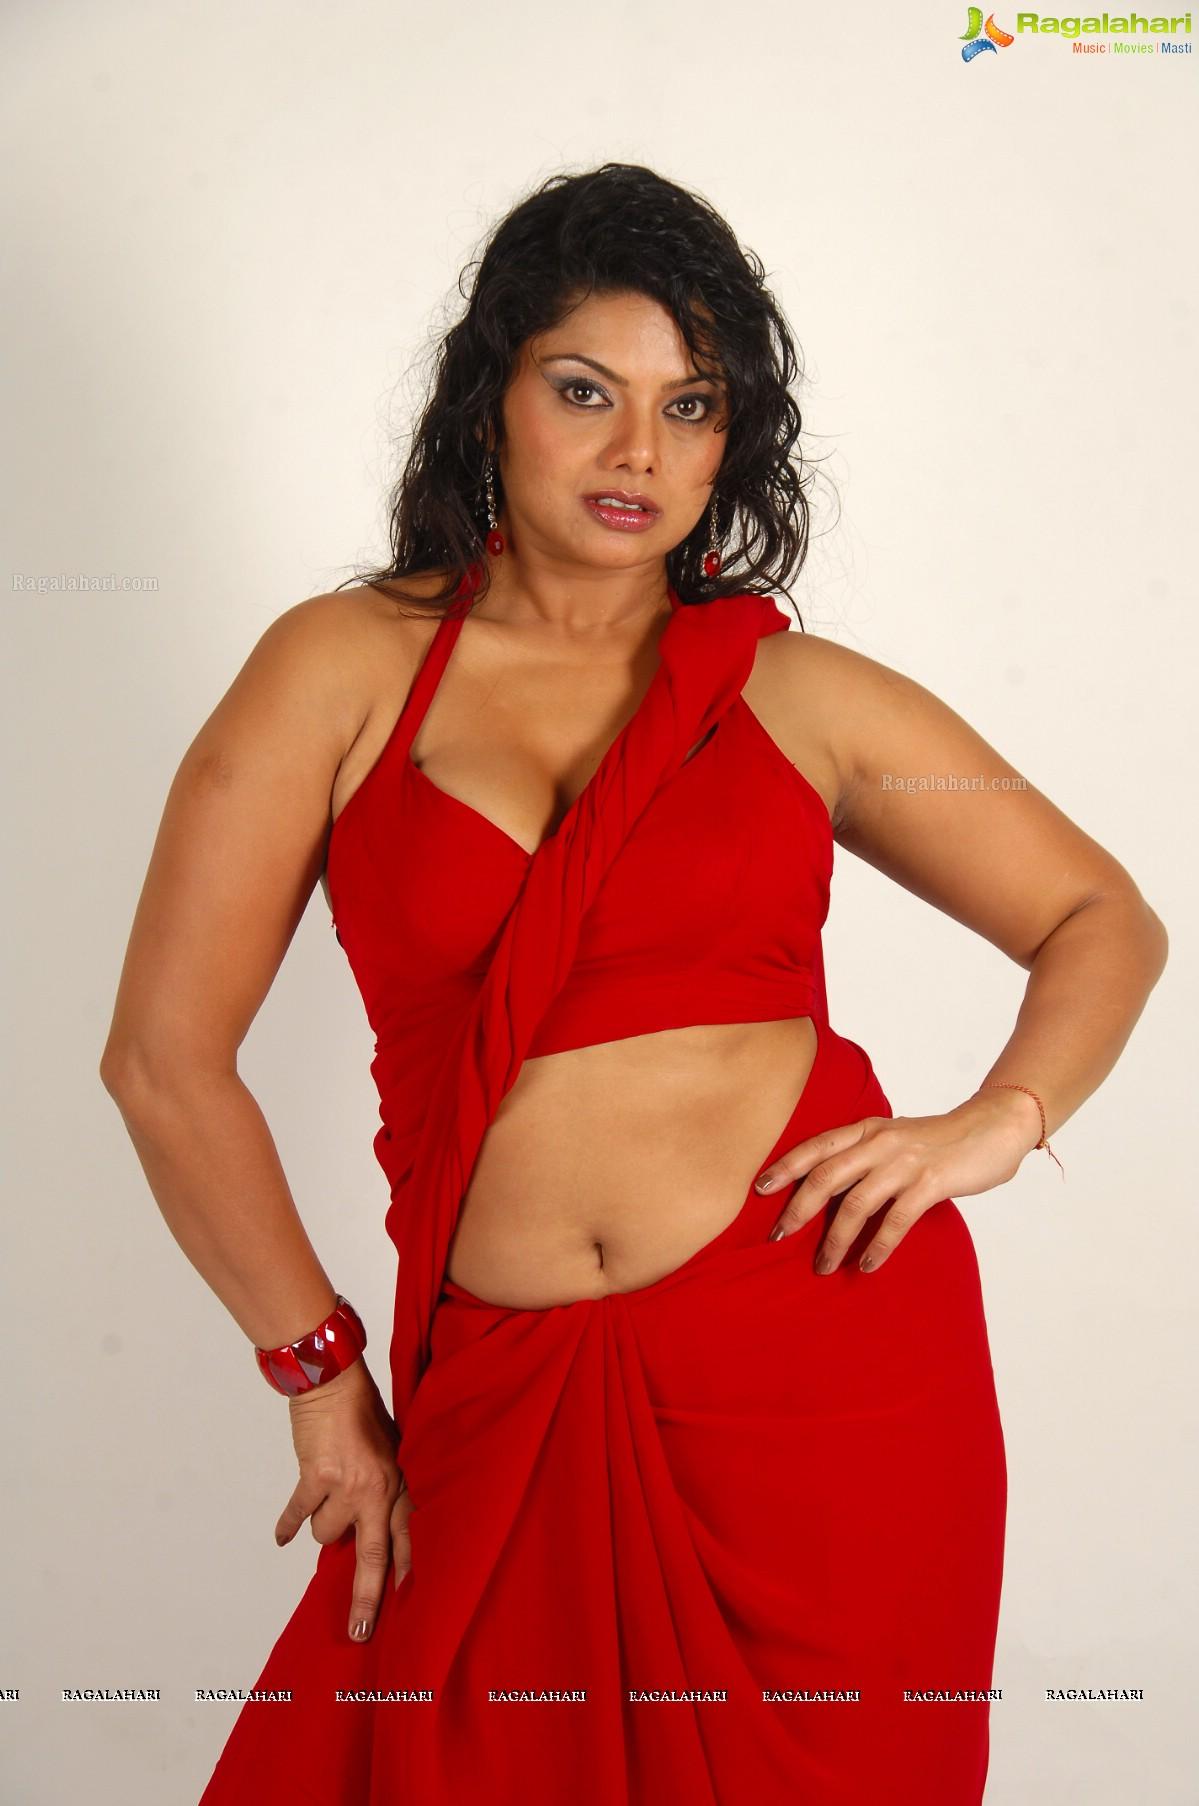 Archana Sexy Saree Removed 3gp Videos